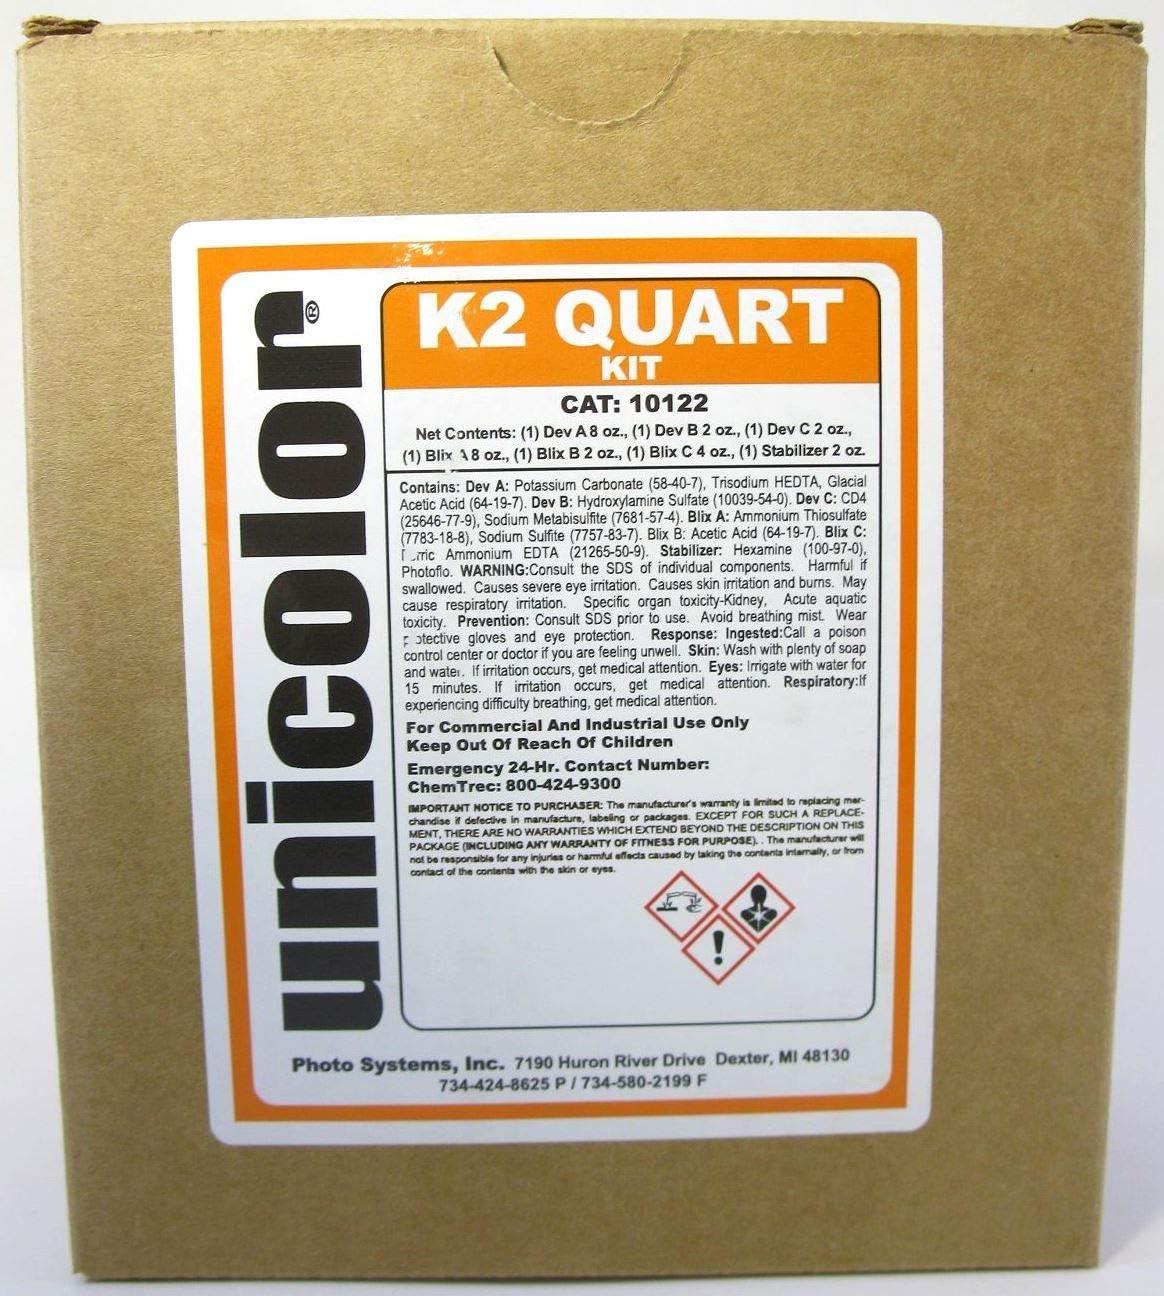 Ultrafine Unicolor C-41 Liquid Home Developer Kit 35mm (1 Quart)